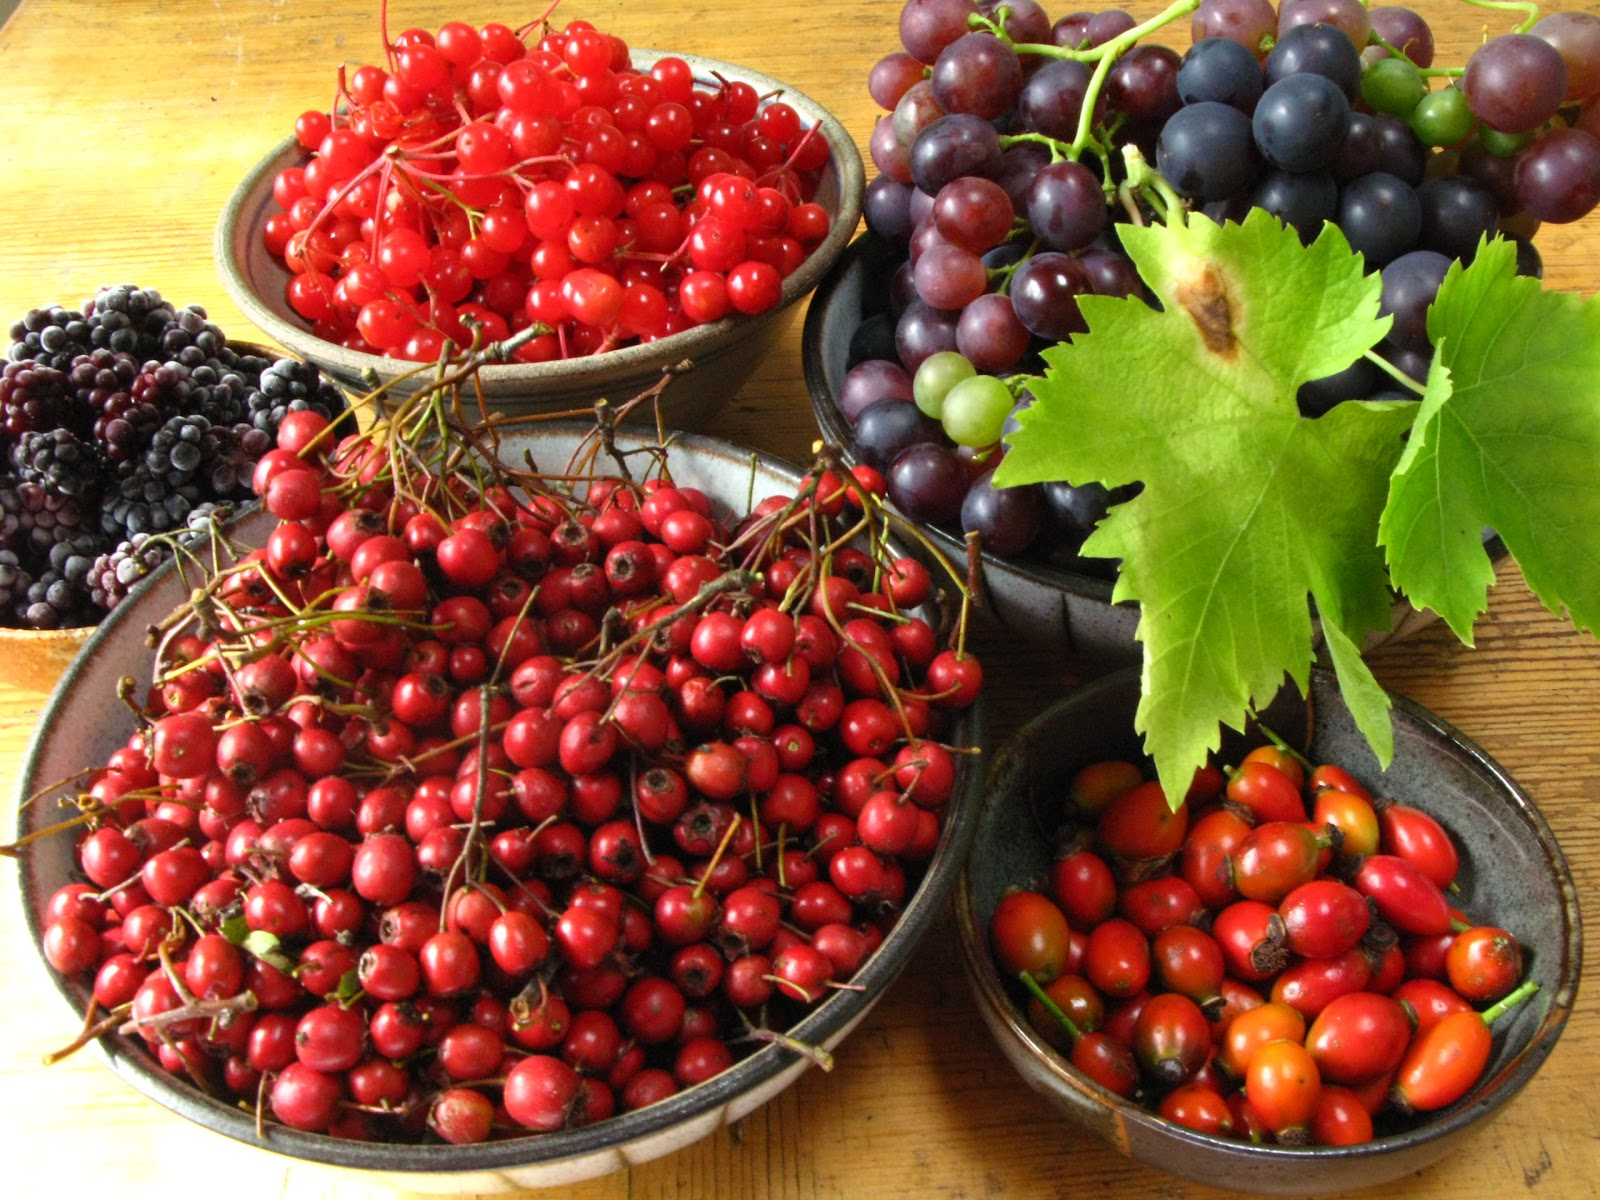 antioxidant food and health benefits